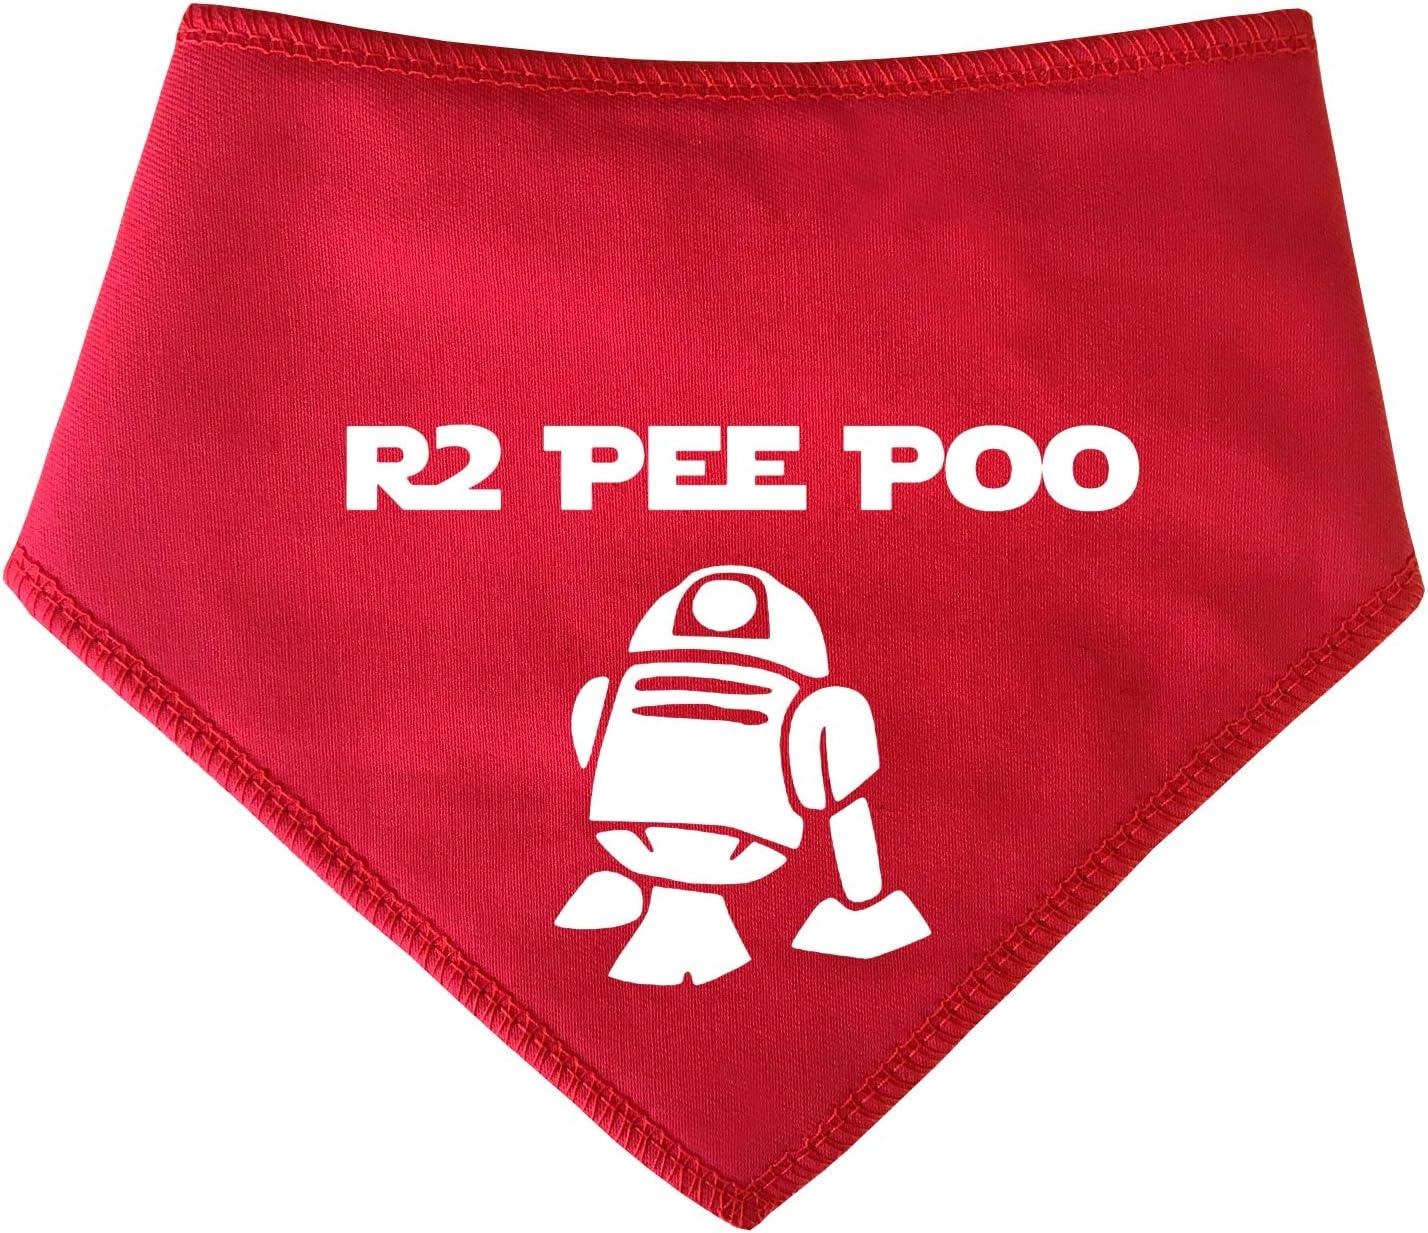 Spoilt Rotten Pets Terriers y Cockerpoo Westies Bandana para Perro Rojo Apto para Perros Shih-tzu S2 R2D2 R2 Pee Poo